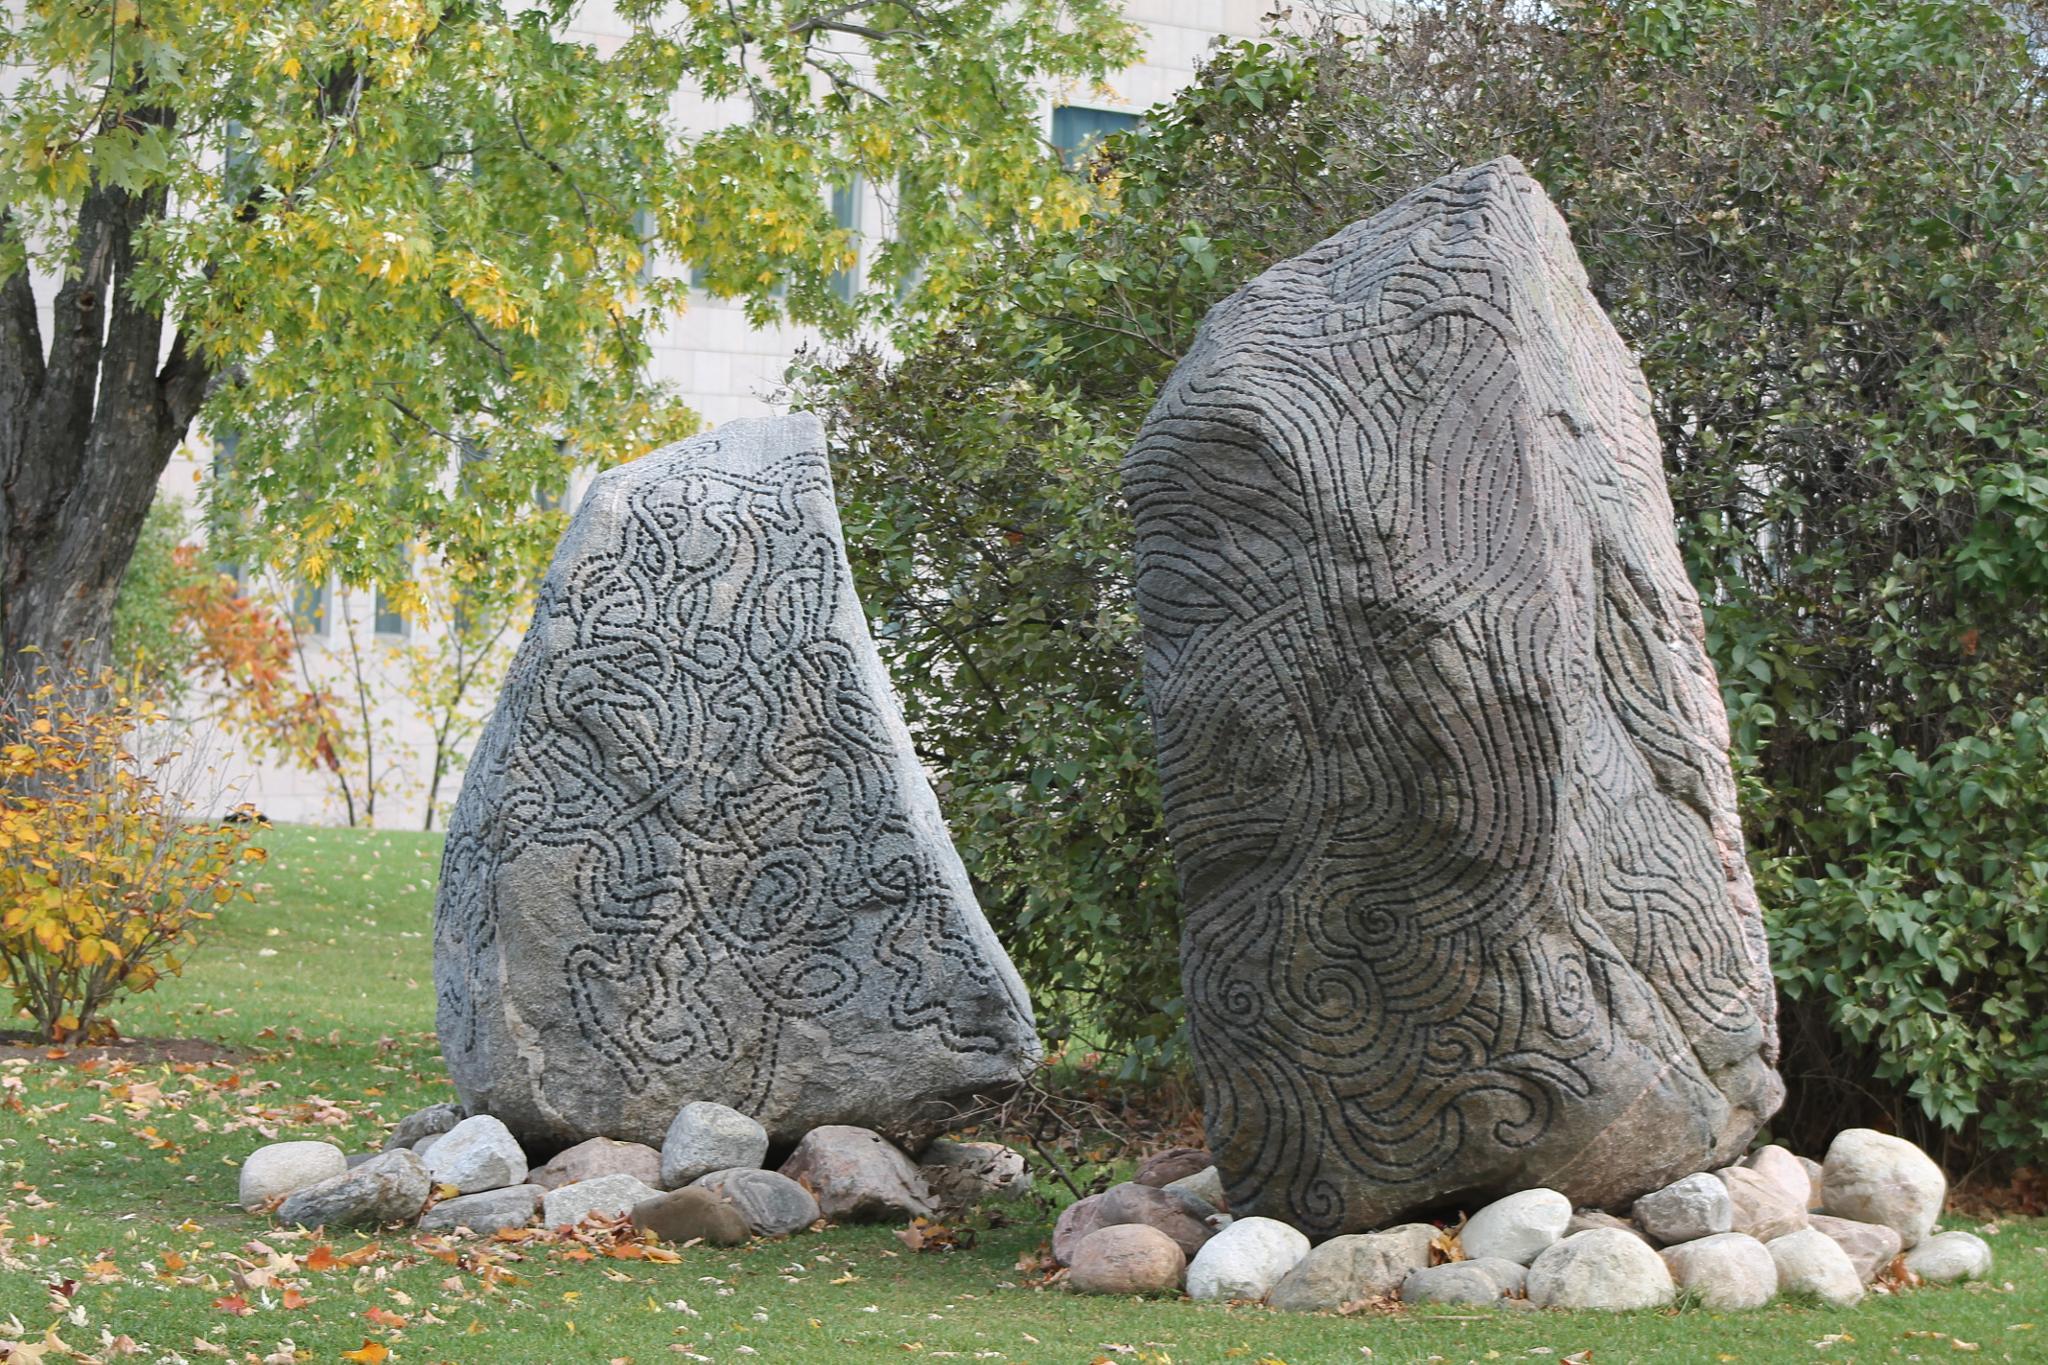 Artistic Rocks by Robert Rusaw